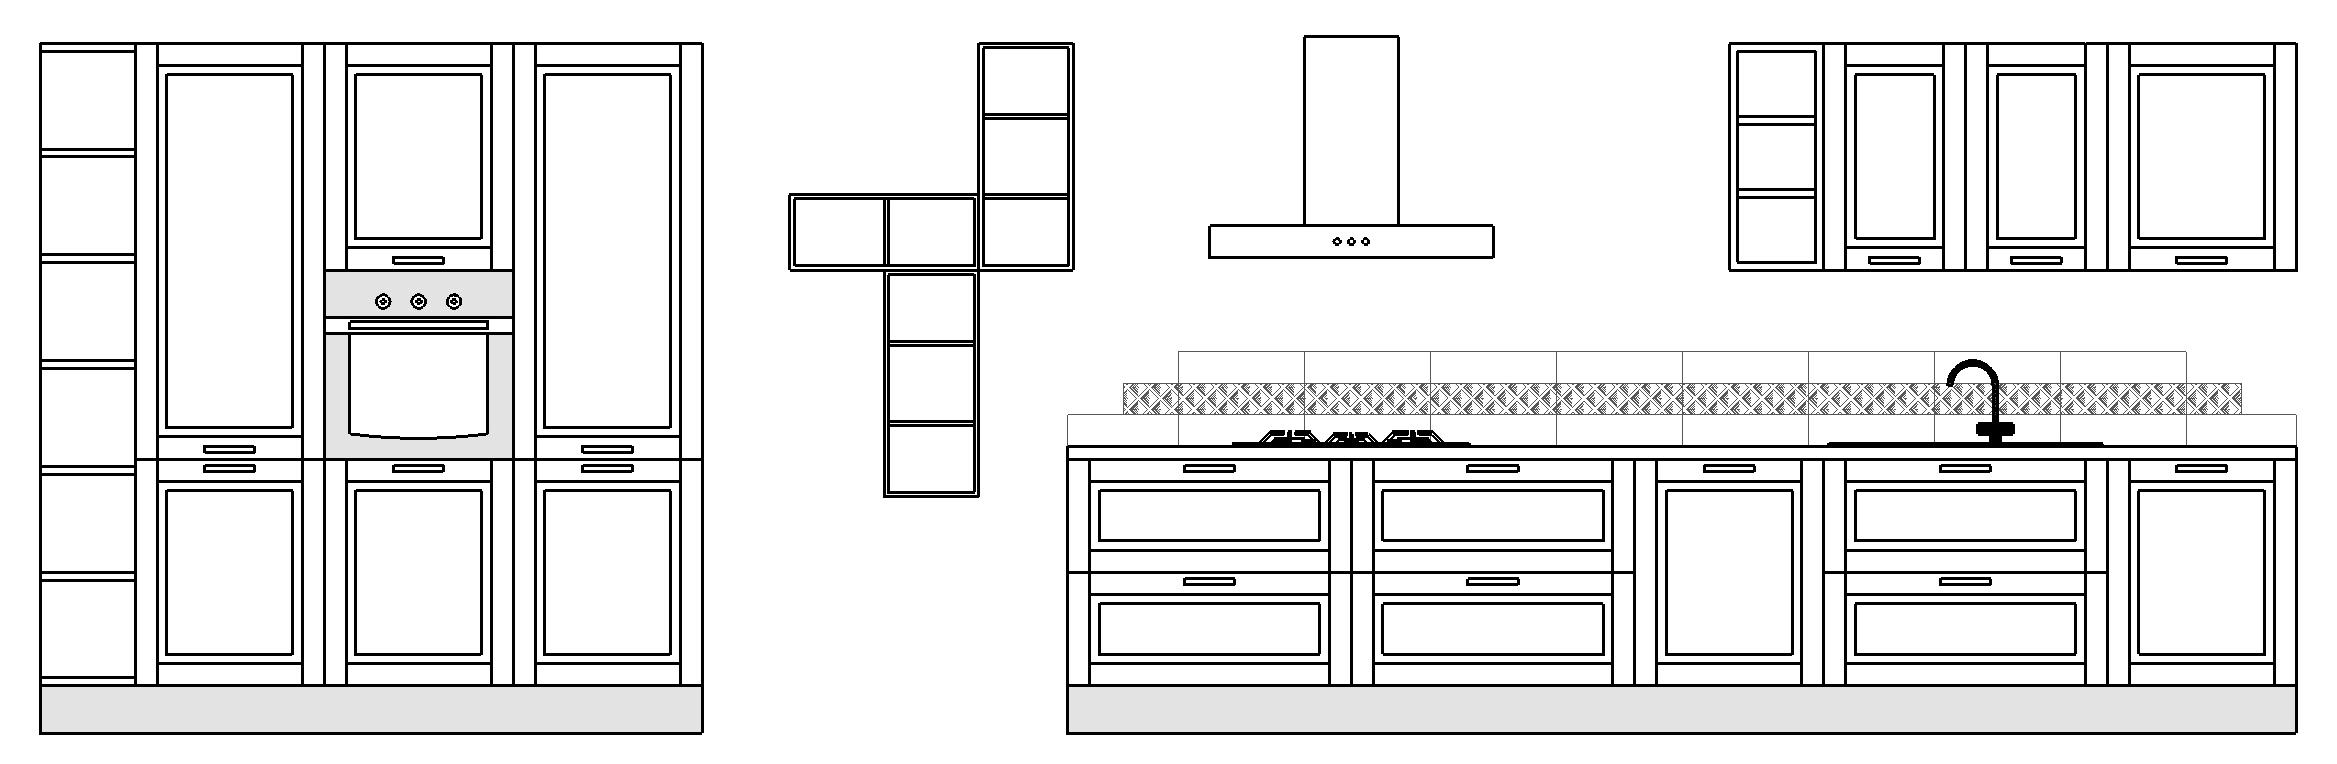 Misure Mobili Cucina. Misure Mobili Cucina With Misure Mobili Cucina ...